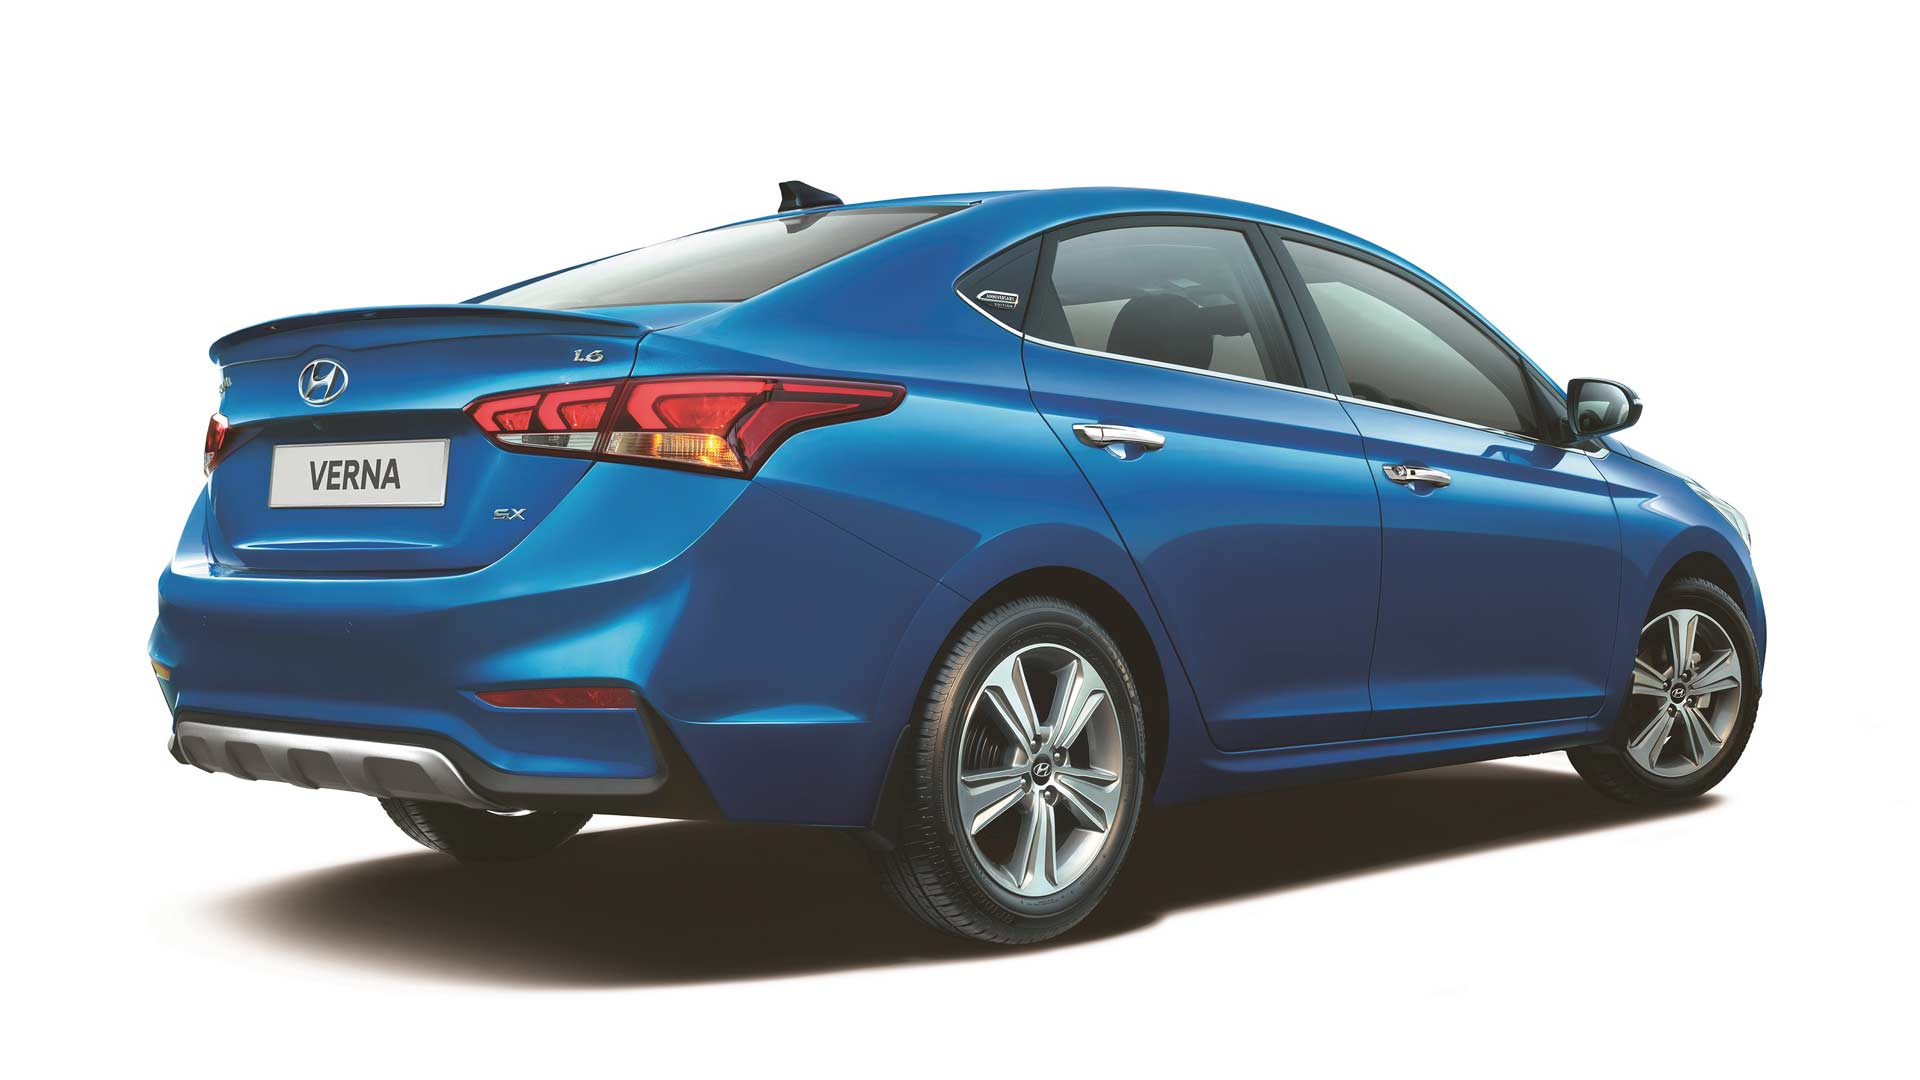 2018-Hyundai-Verna-Anniversary-Edition_2